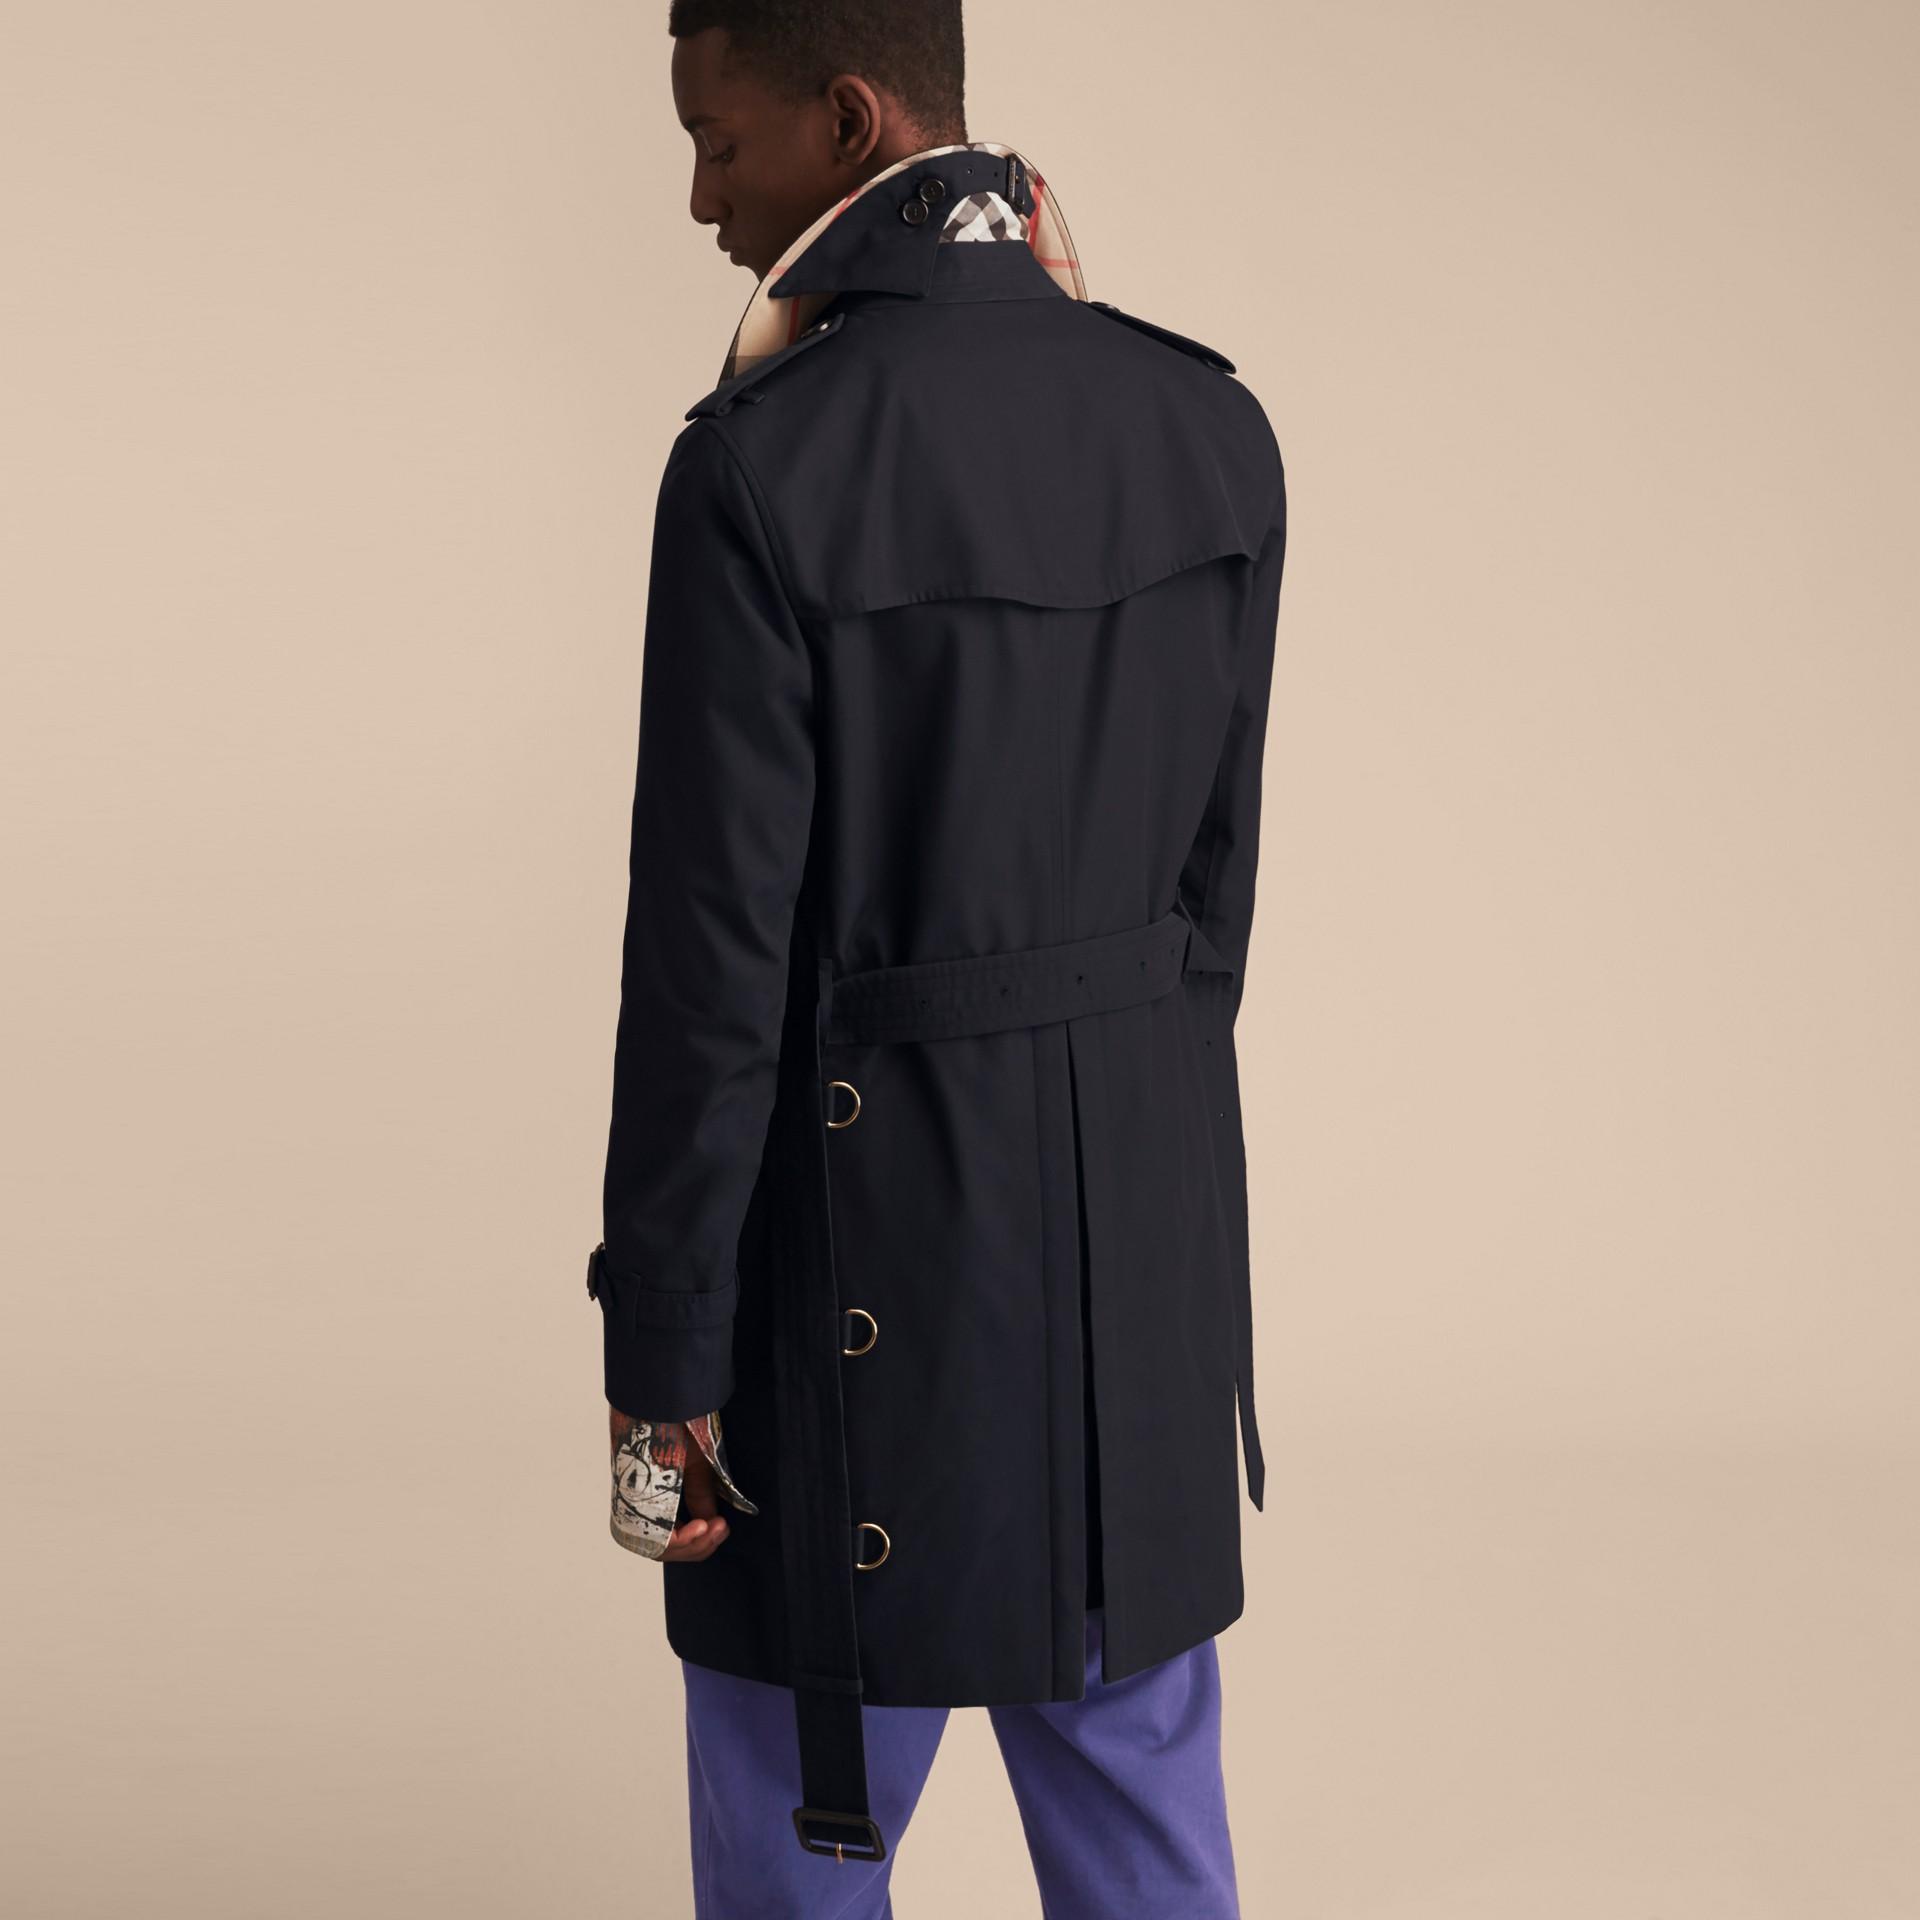 Azul marinho The Sandringham - Trench coat Heritage longo Azul Marinho - galeria de imagens 4